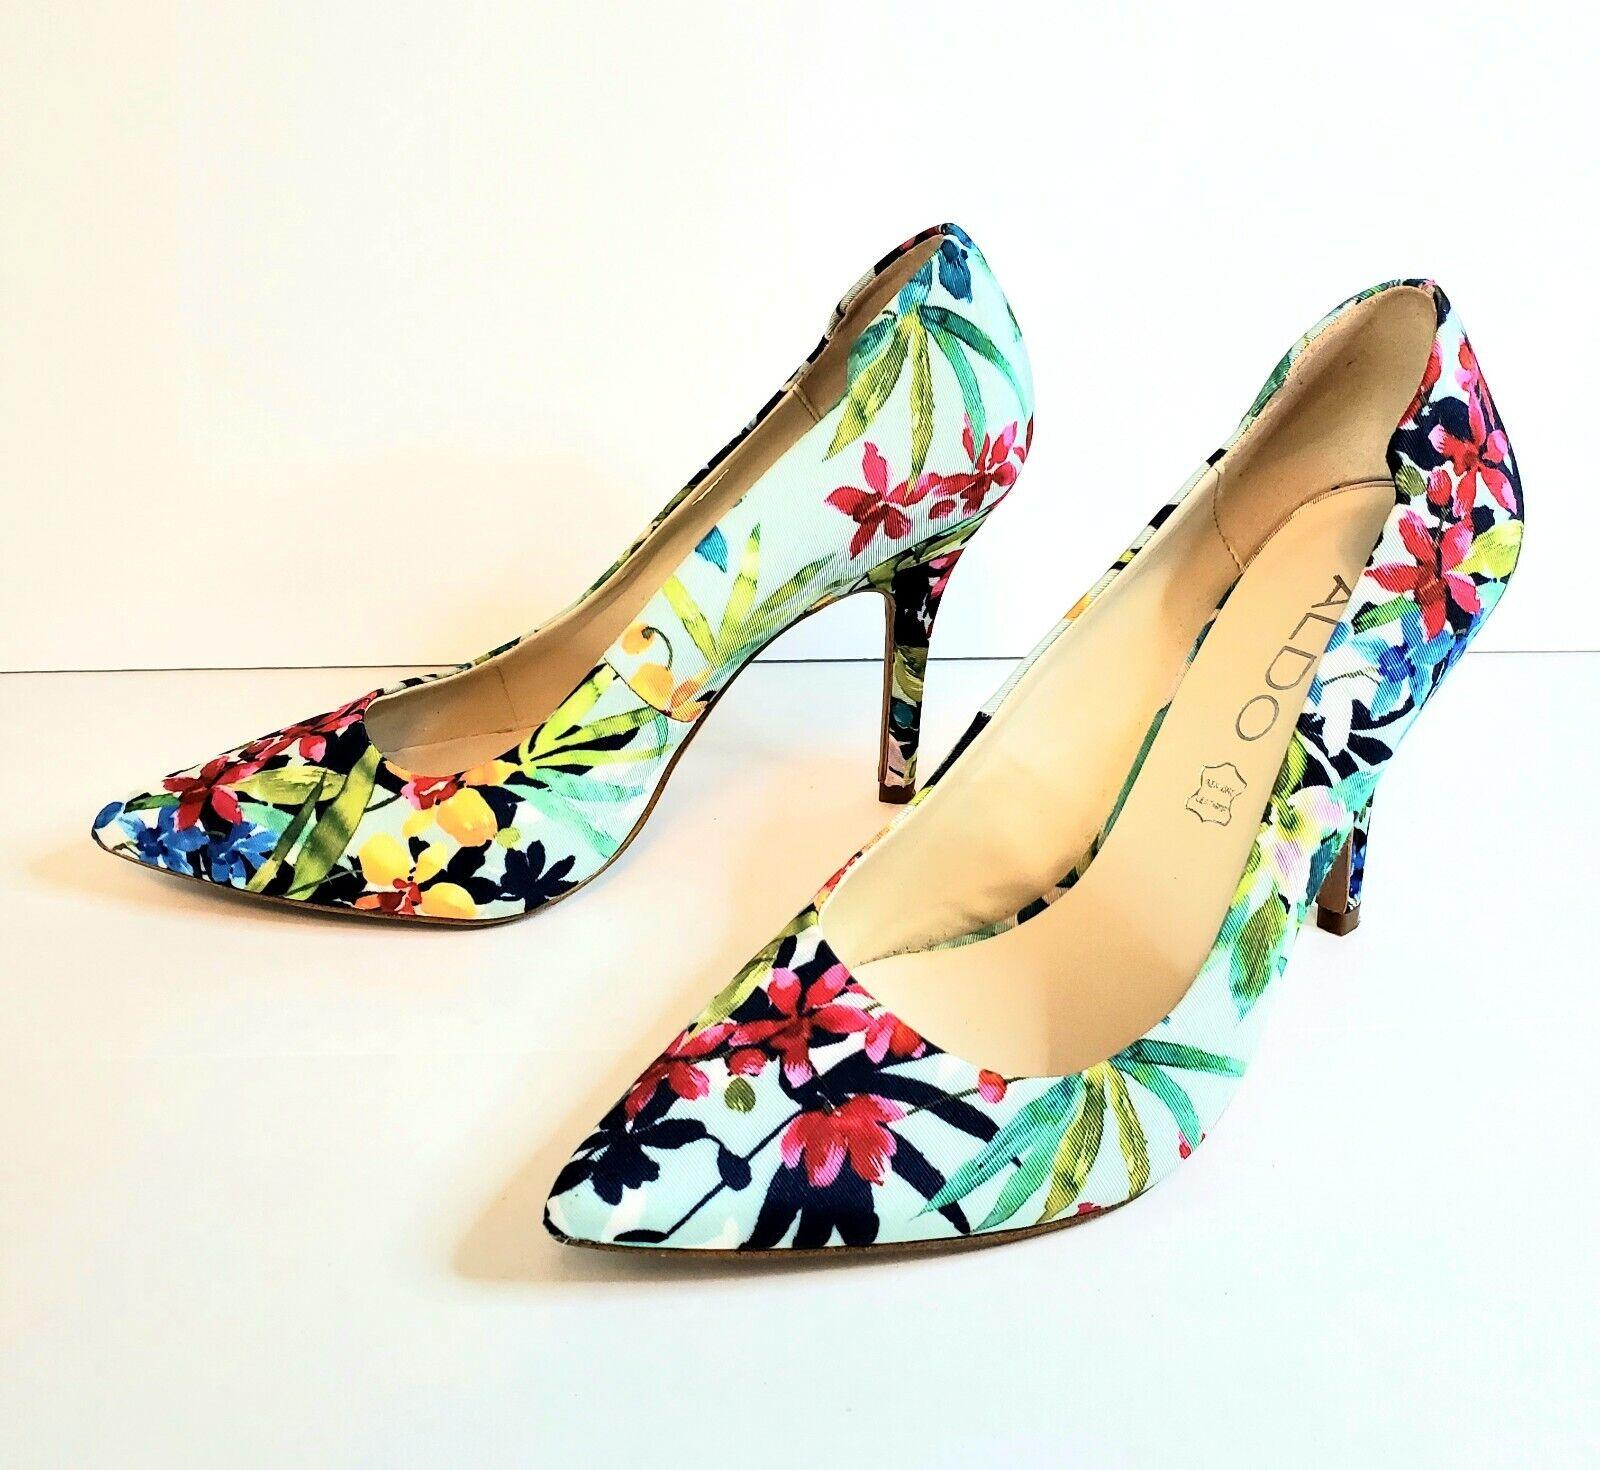 ALDO Ybuvia Womens Size 6.5 Floral Pointed Toe Stiletto High Heels Pumps EUC